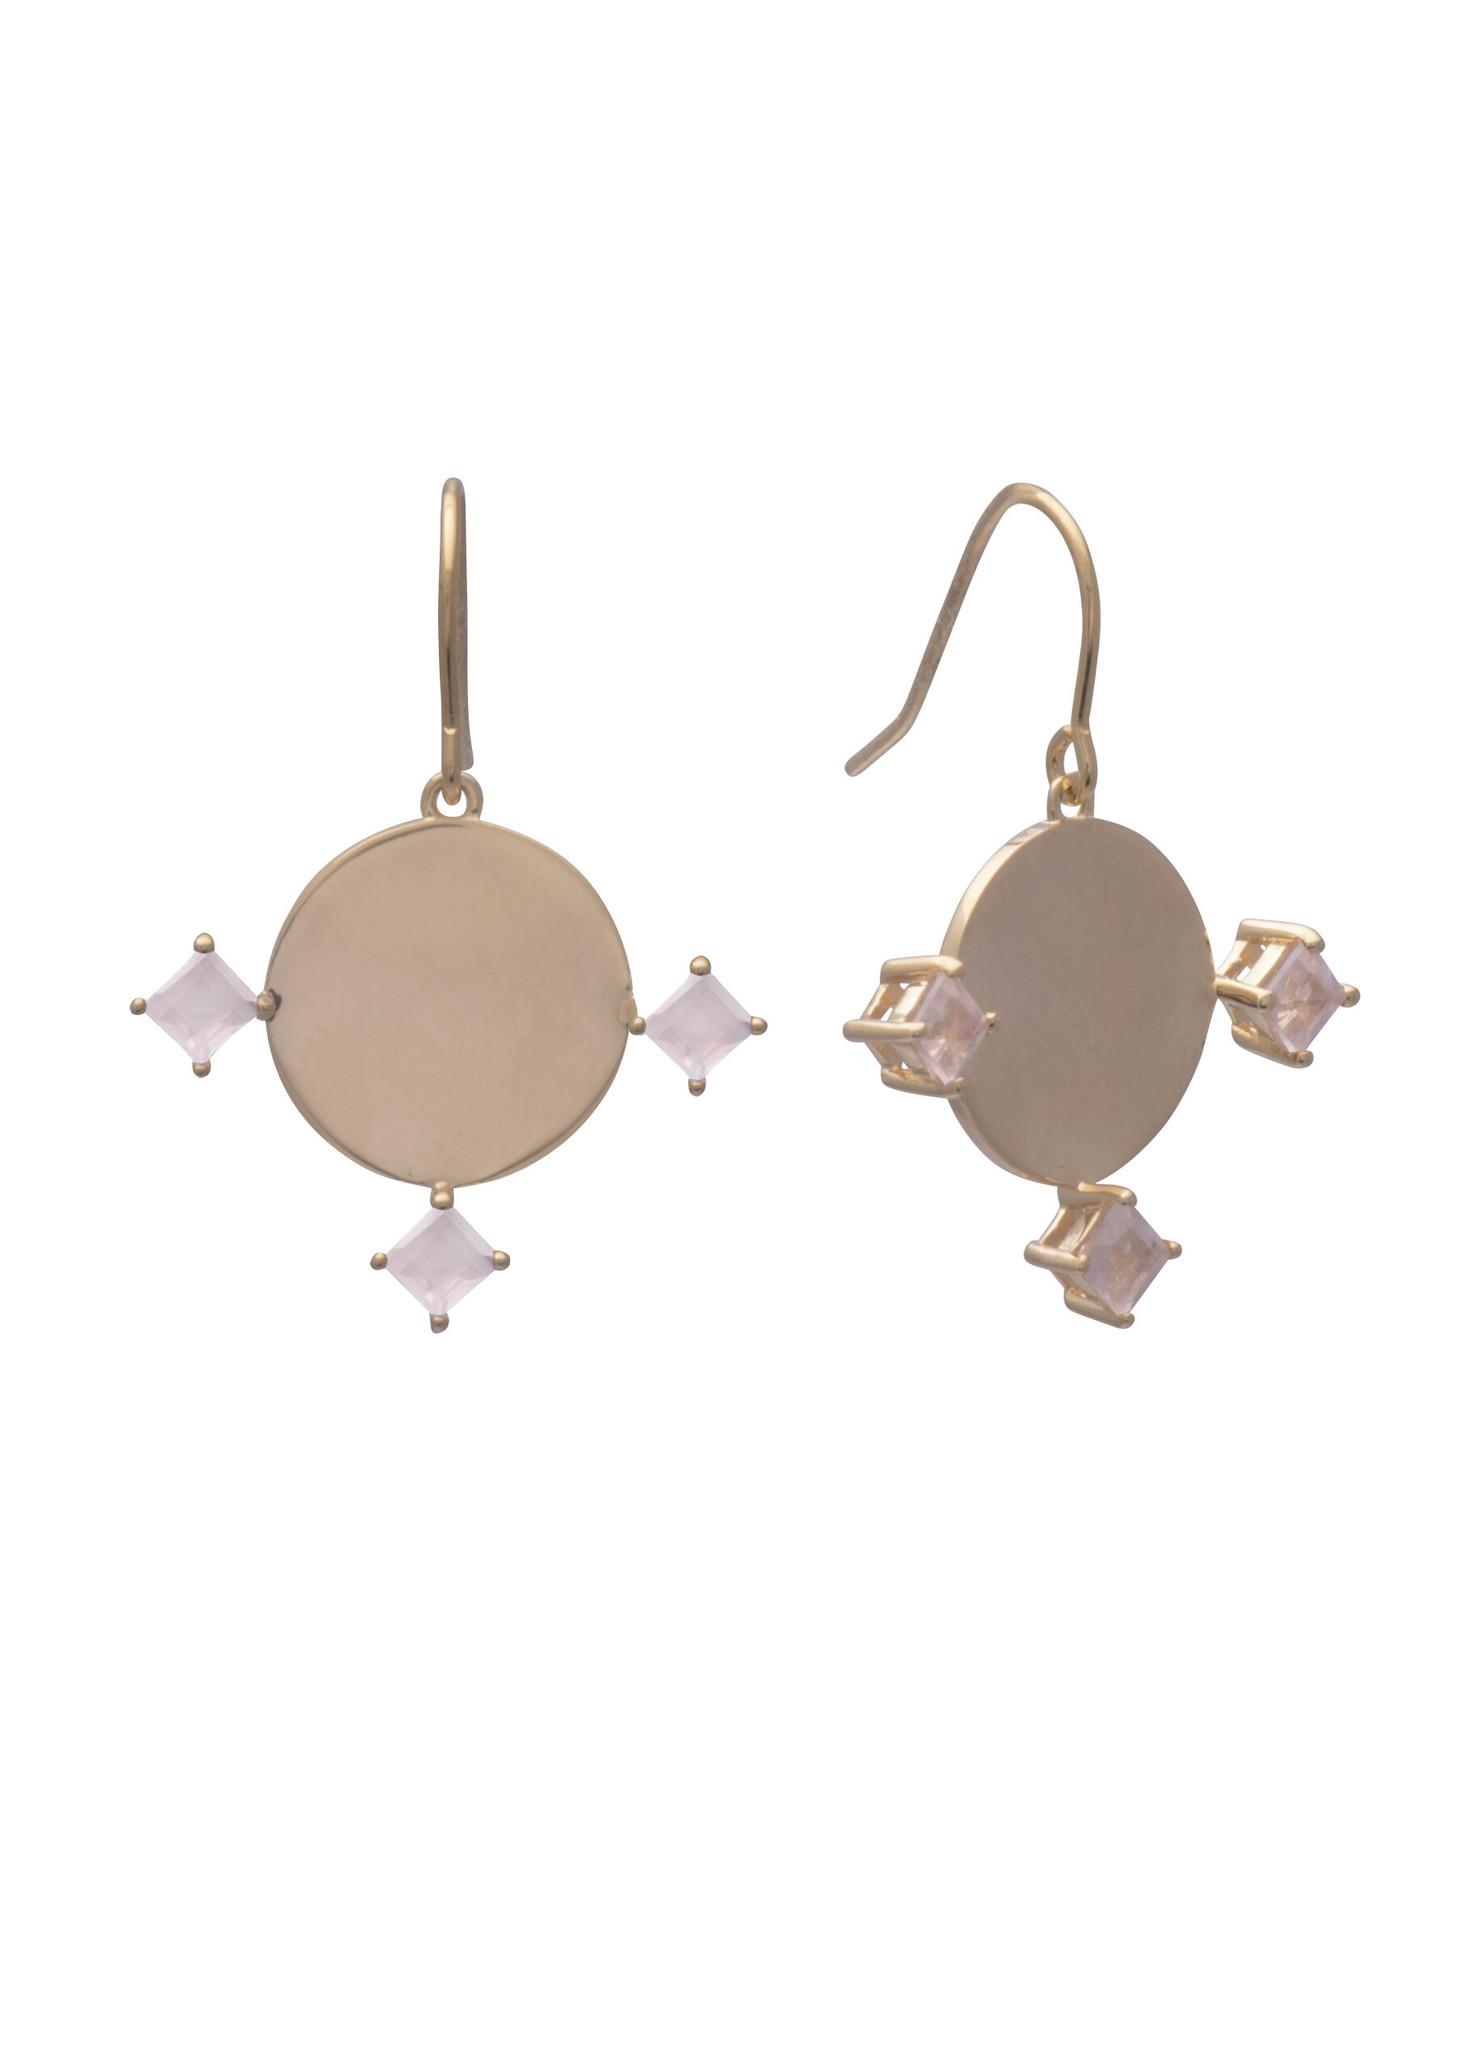 Sarah Mulder Jewelry Imperial Earrings